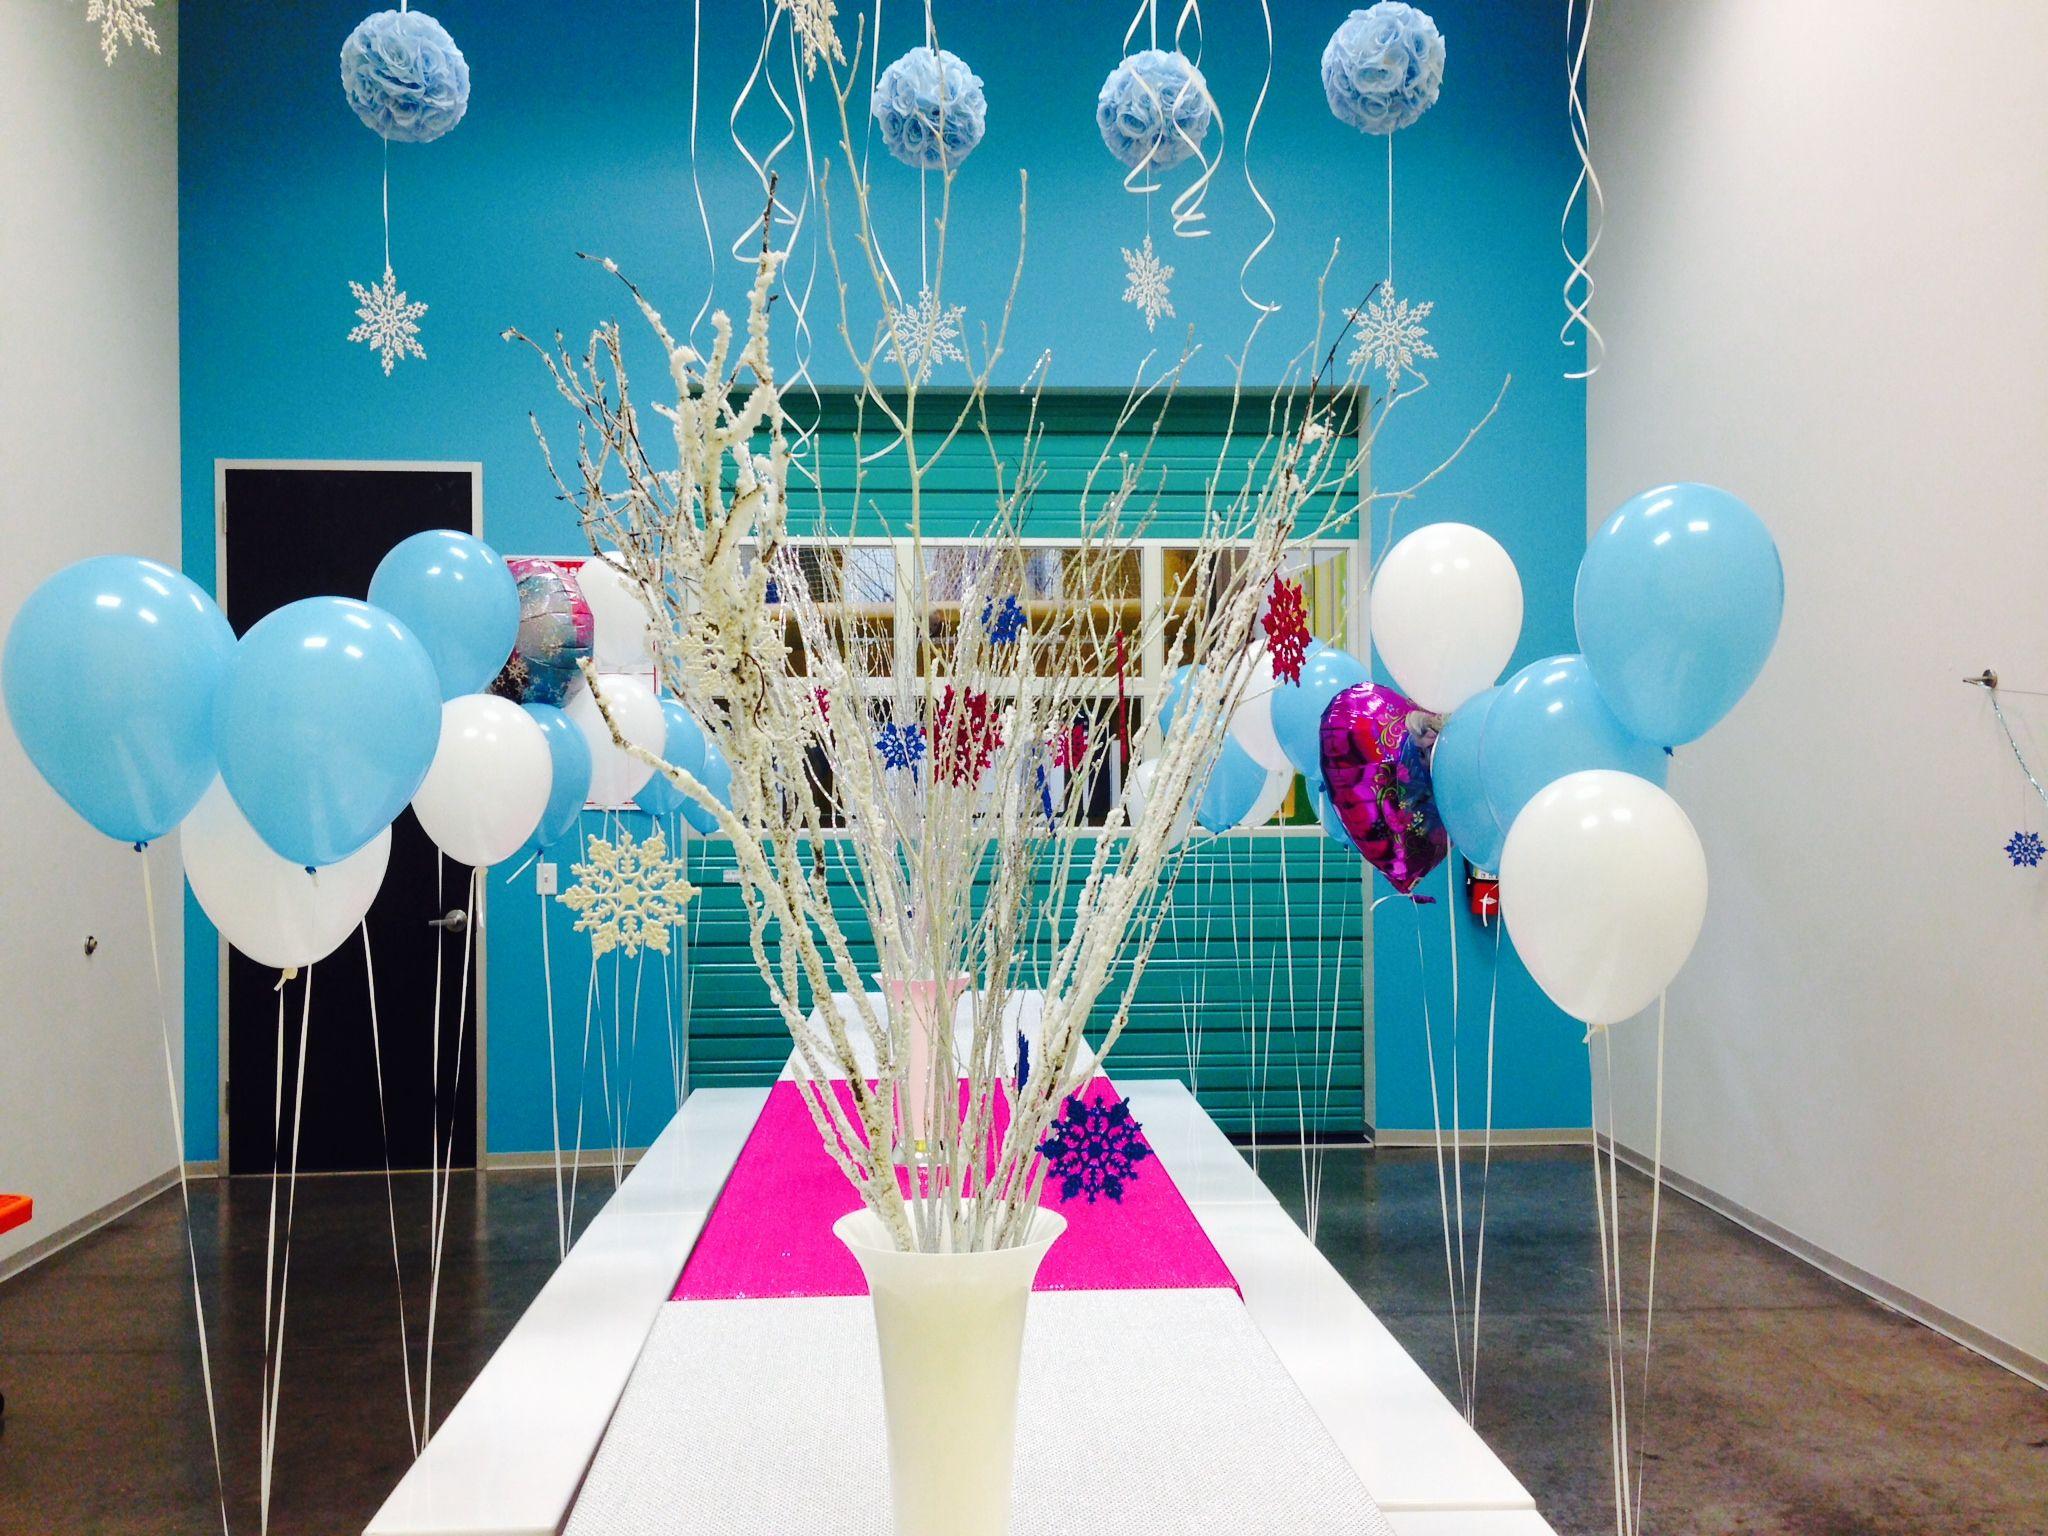 Decoracion de frozen globos frozen party - Decoracion con globos para cumpleanos ...